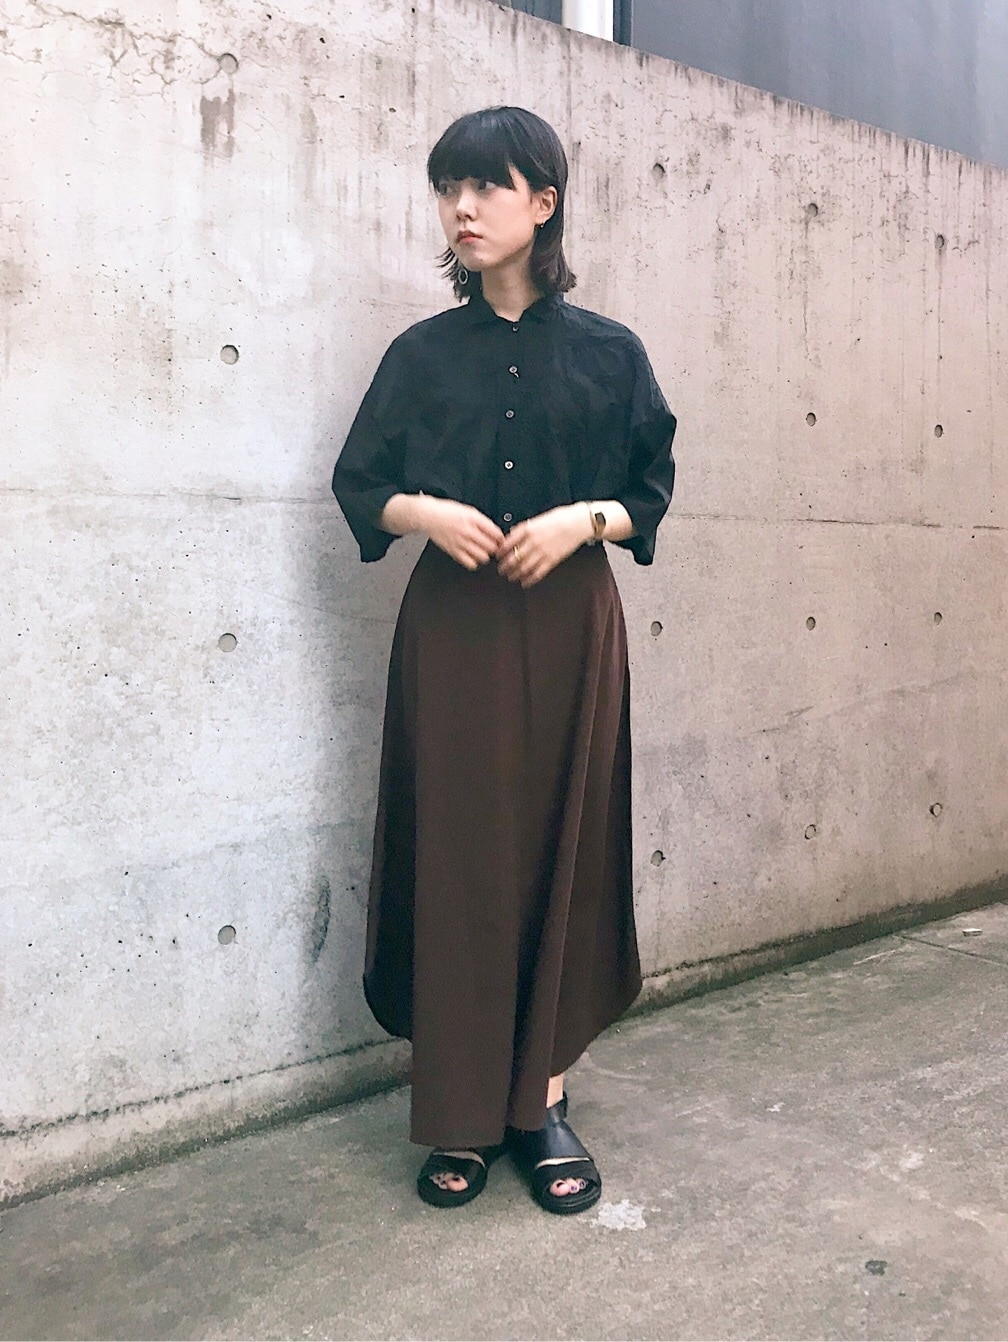 bulle de savon 中目黒路面 身長:153cm 2019.07.29